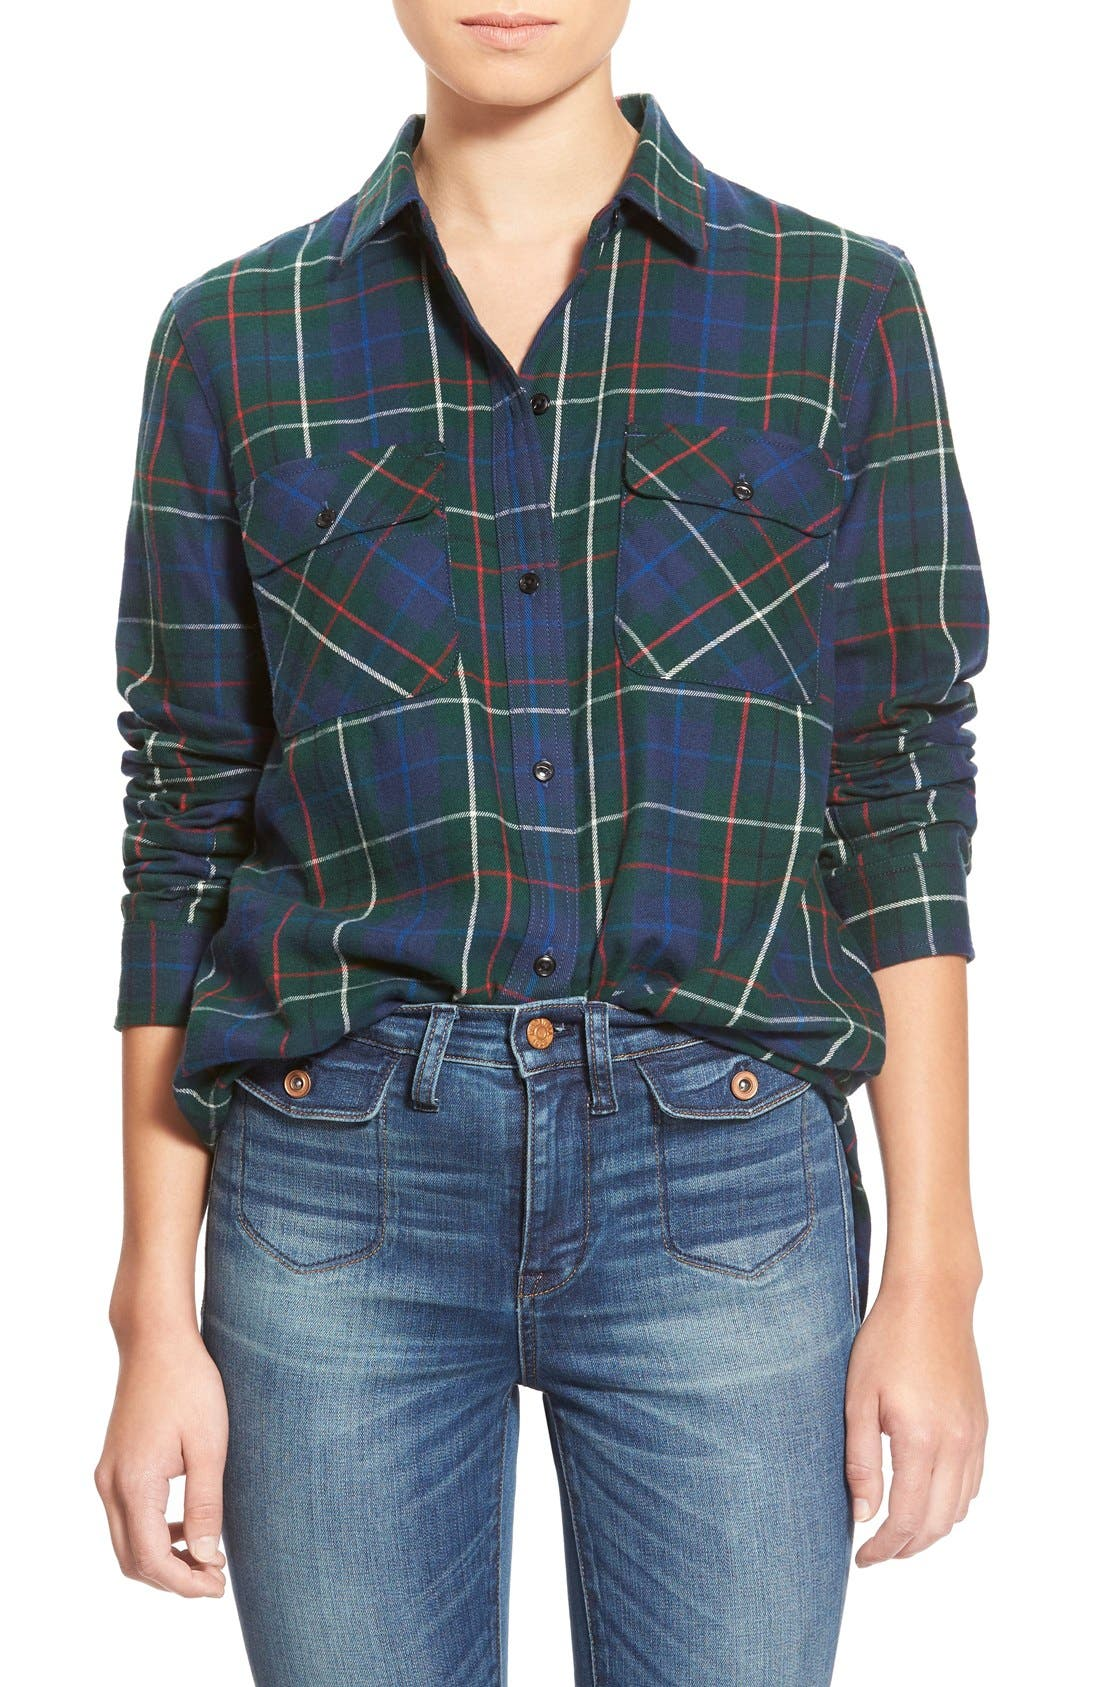 Alternate Image 1 Selected - Madewell Ex Boyfriend - Ontario Plaid Flannel Shirt